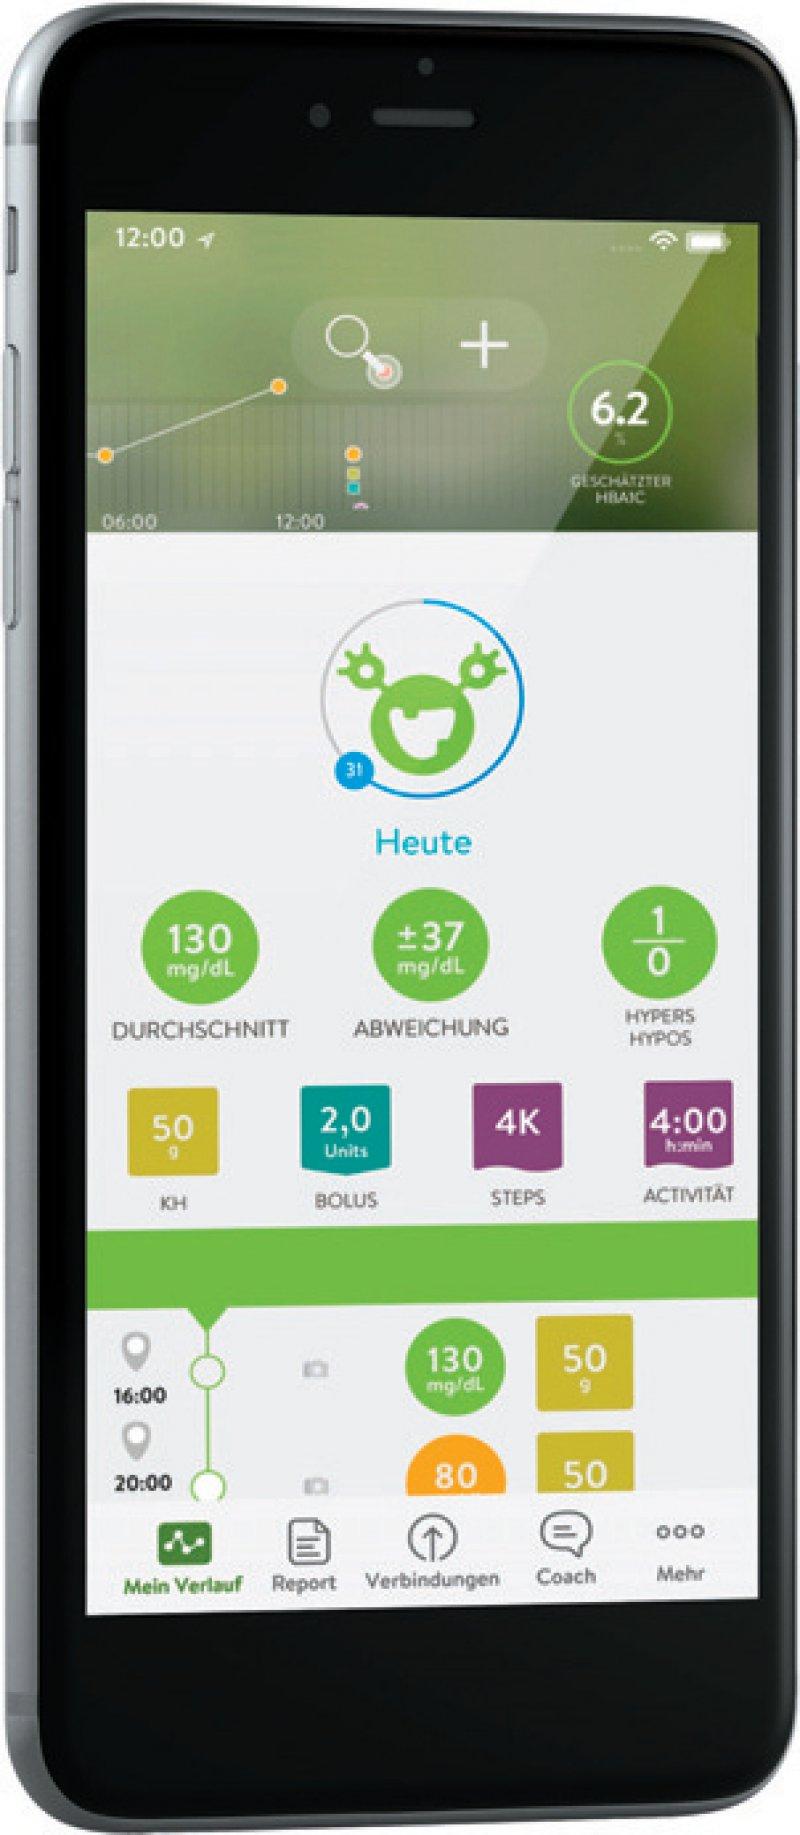 Foto: vege/ stock.adobe.com; 2020 mySugr GmbH [m]